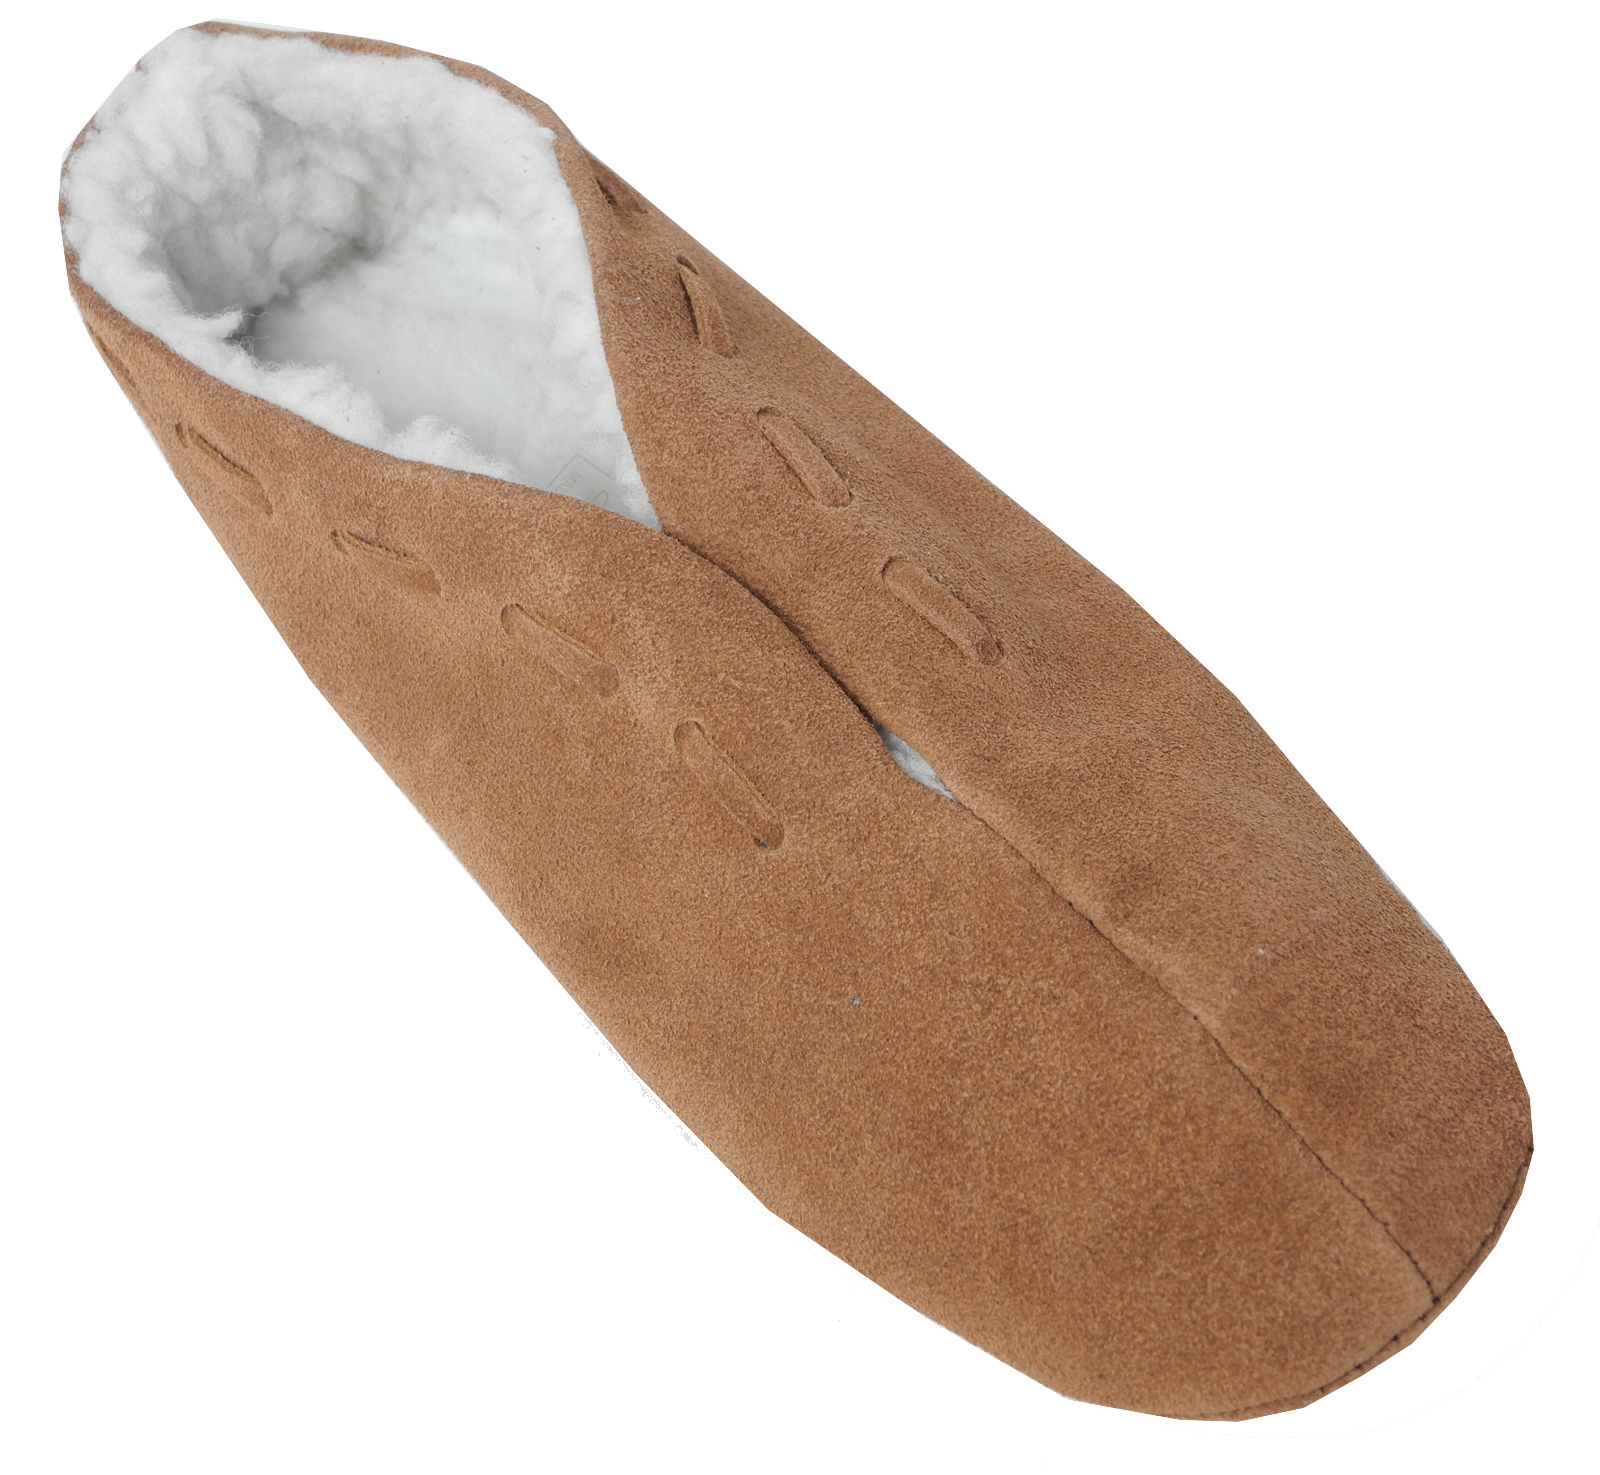 Chicos Damas De Gamuza De Cuero de imitación borreguillo Forrado De Zapatos Español Zapatillas Talle 3-9